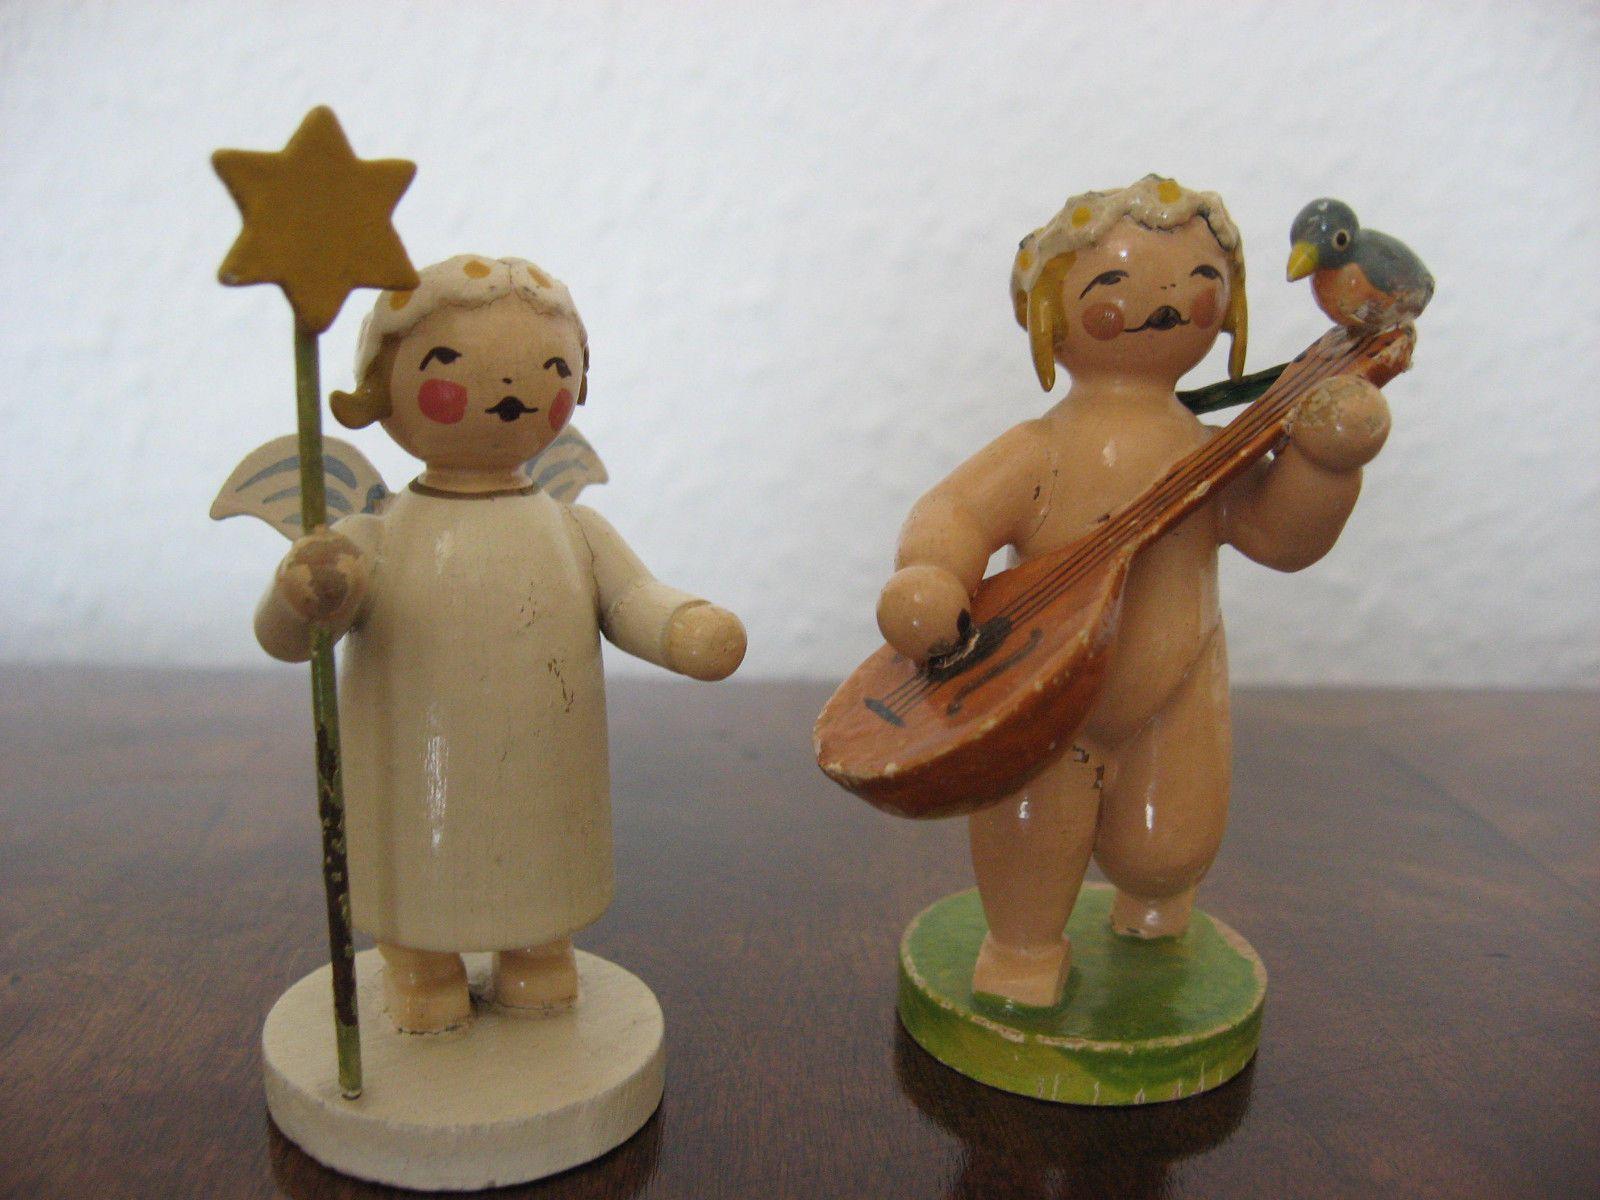 Wendt Amp Kuhn 2 Alte Engel Erzgebirge Vorkrieg Antiquitaten Amp Kunst Volkskunst Erzgebirge E Erzgebirge Traditioneller Weihnachtsschmuck Wendt Kuhn